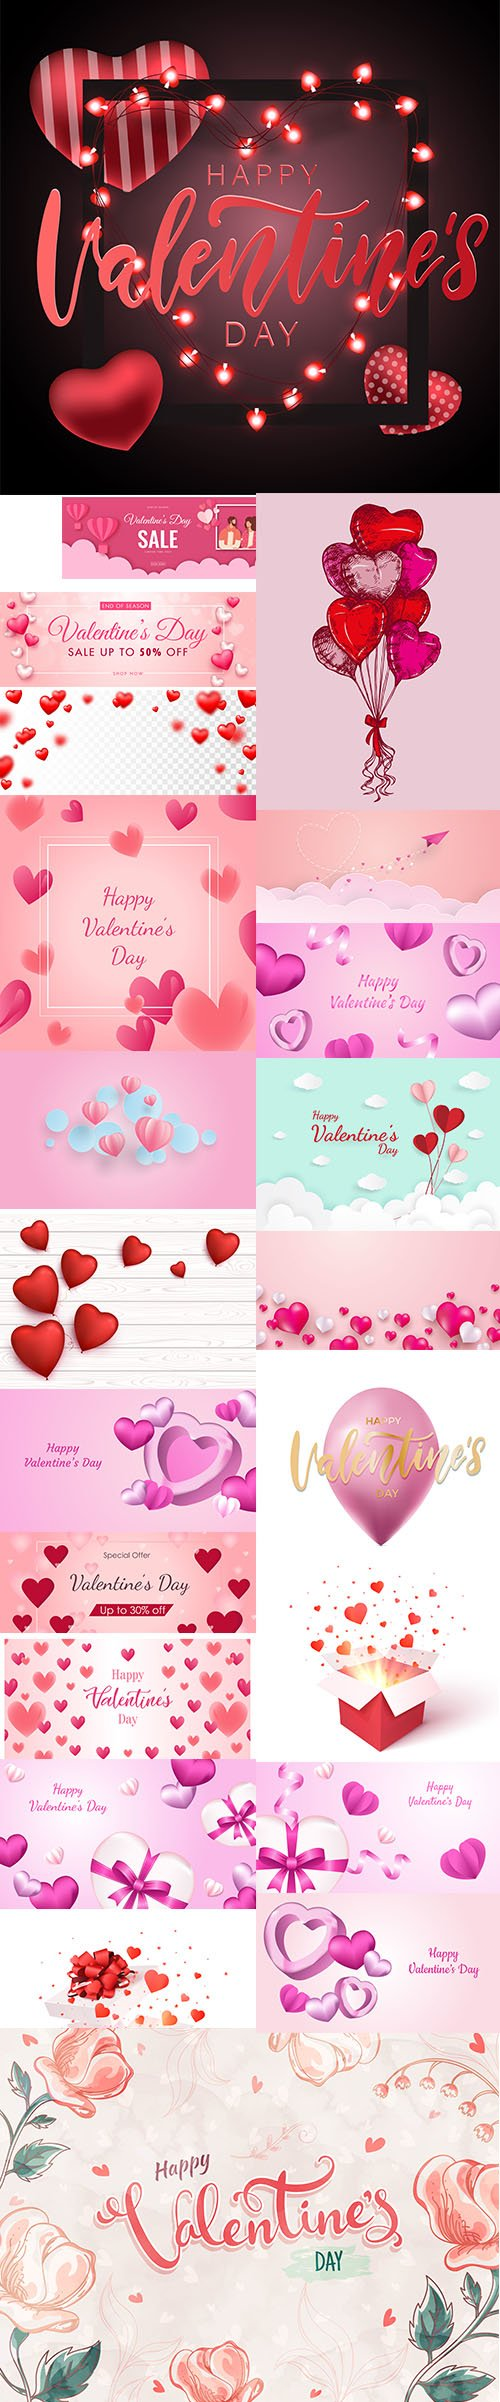 Set of Romantic Valentines Day Illustrations Vol 11